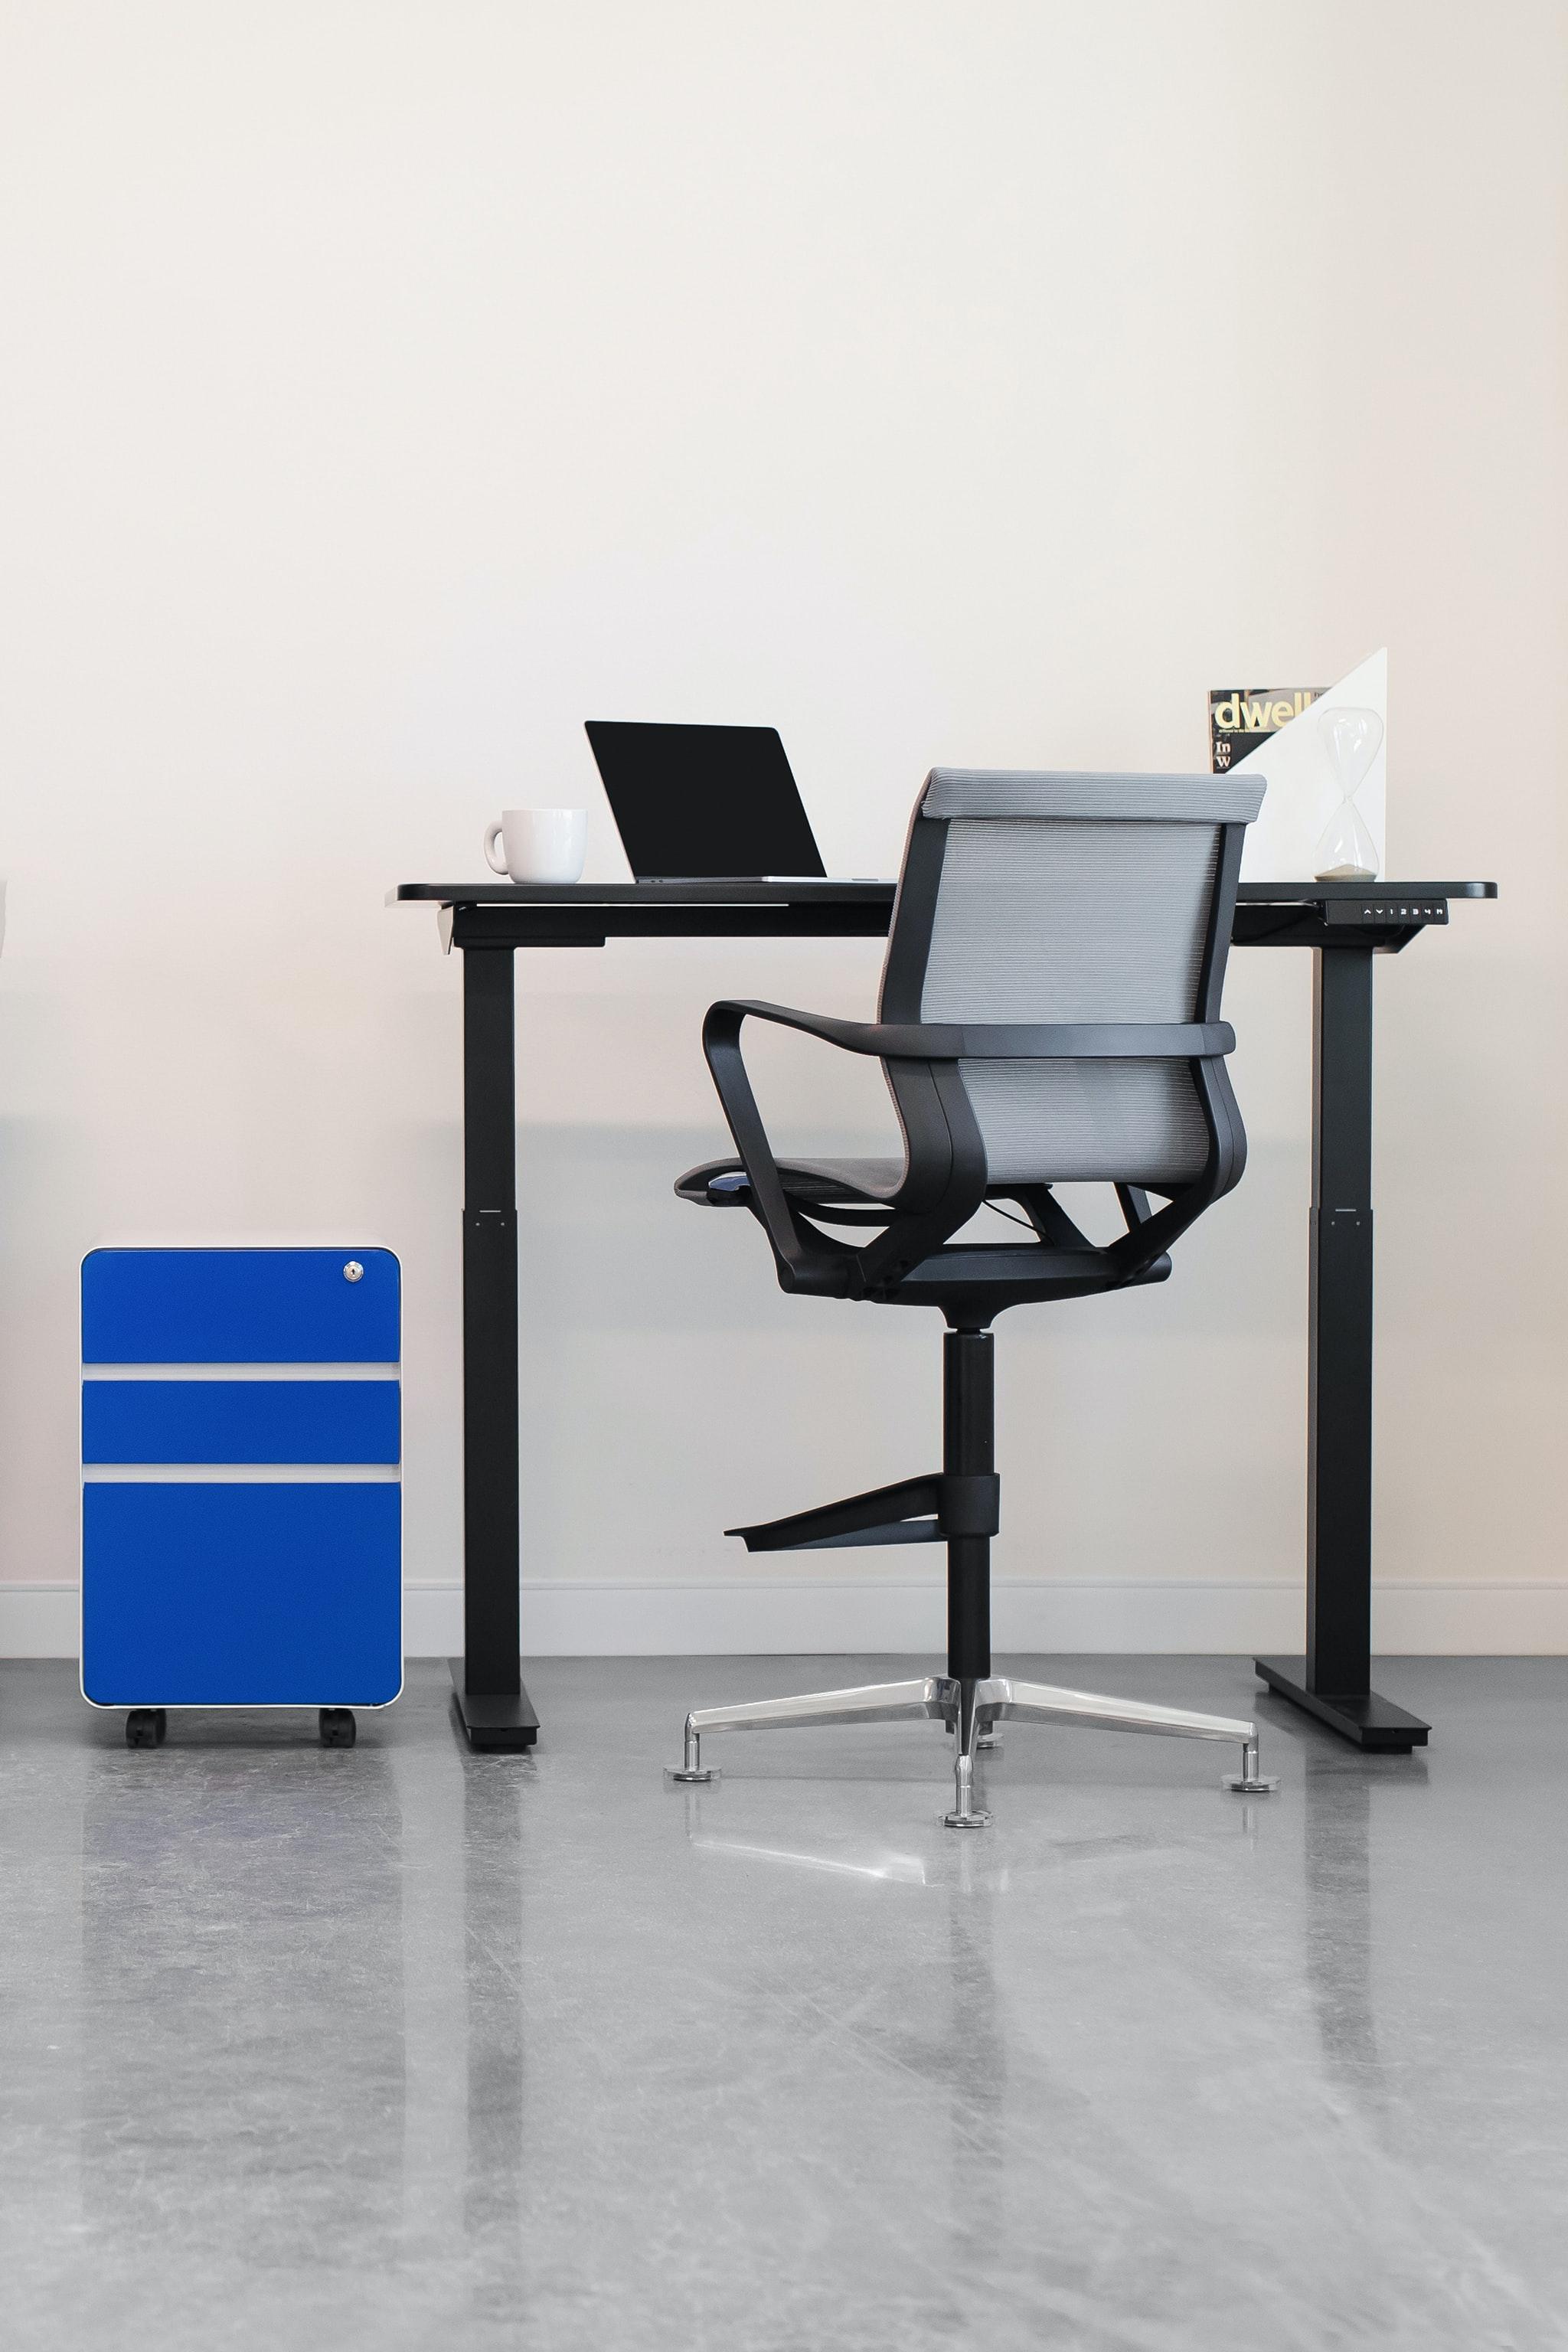 Empty Desk Pictures Download Free Images On Unsplash